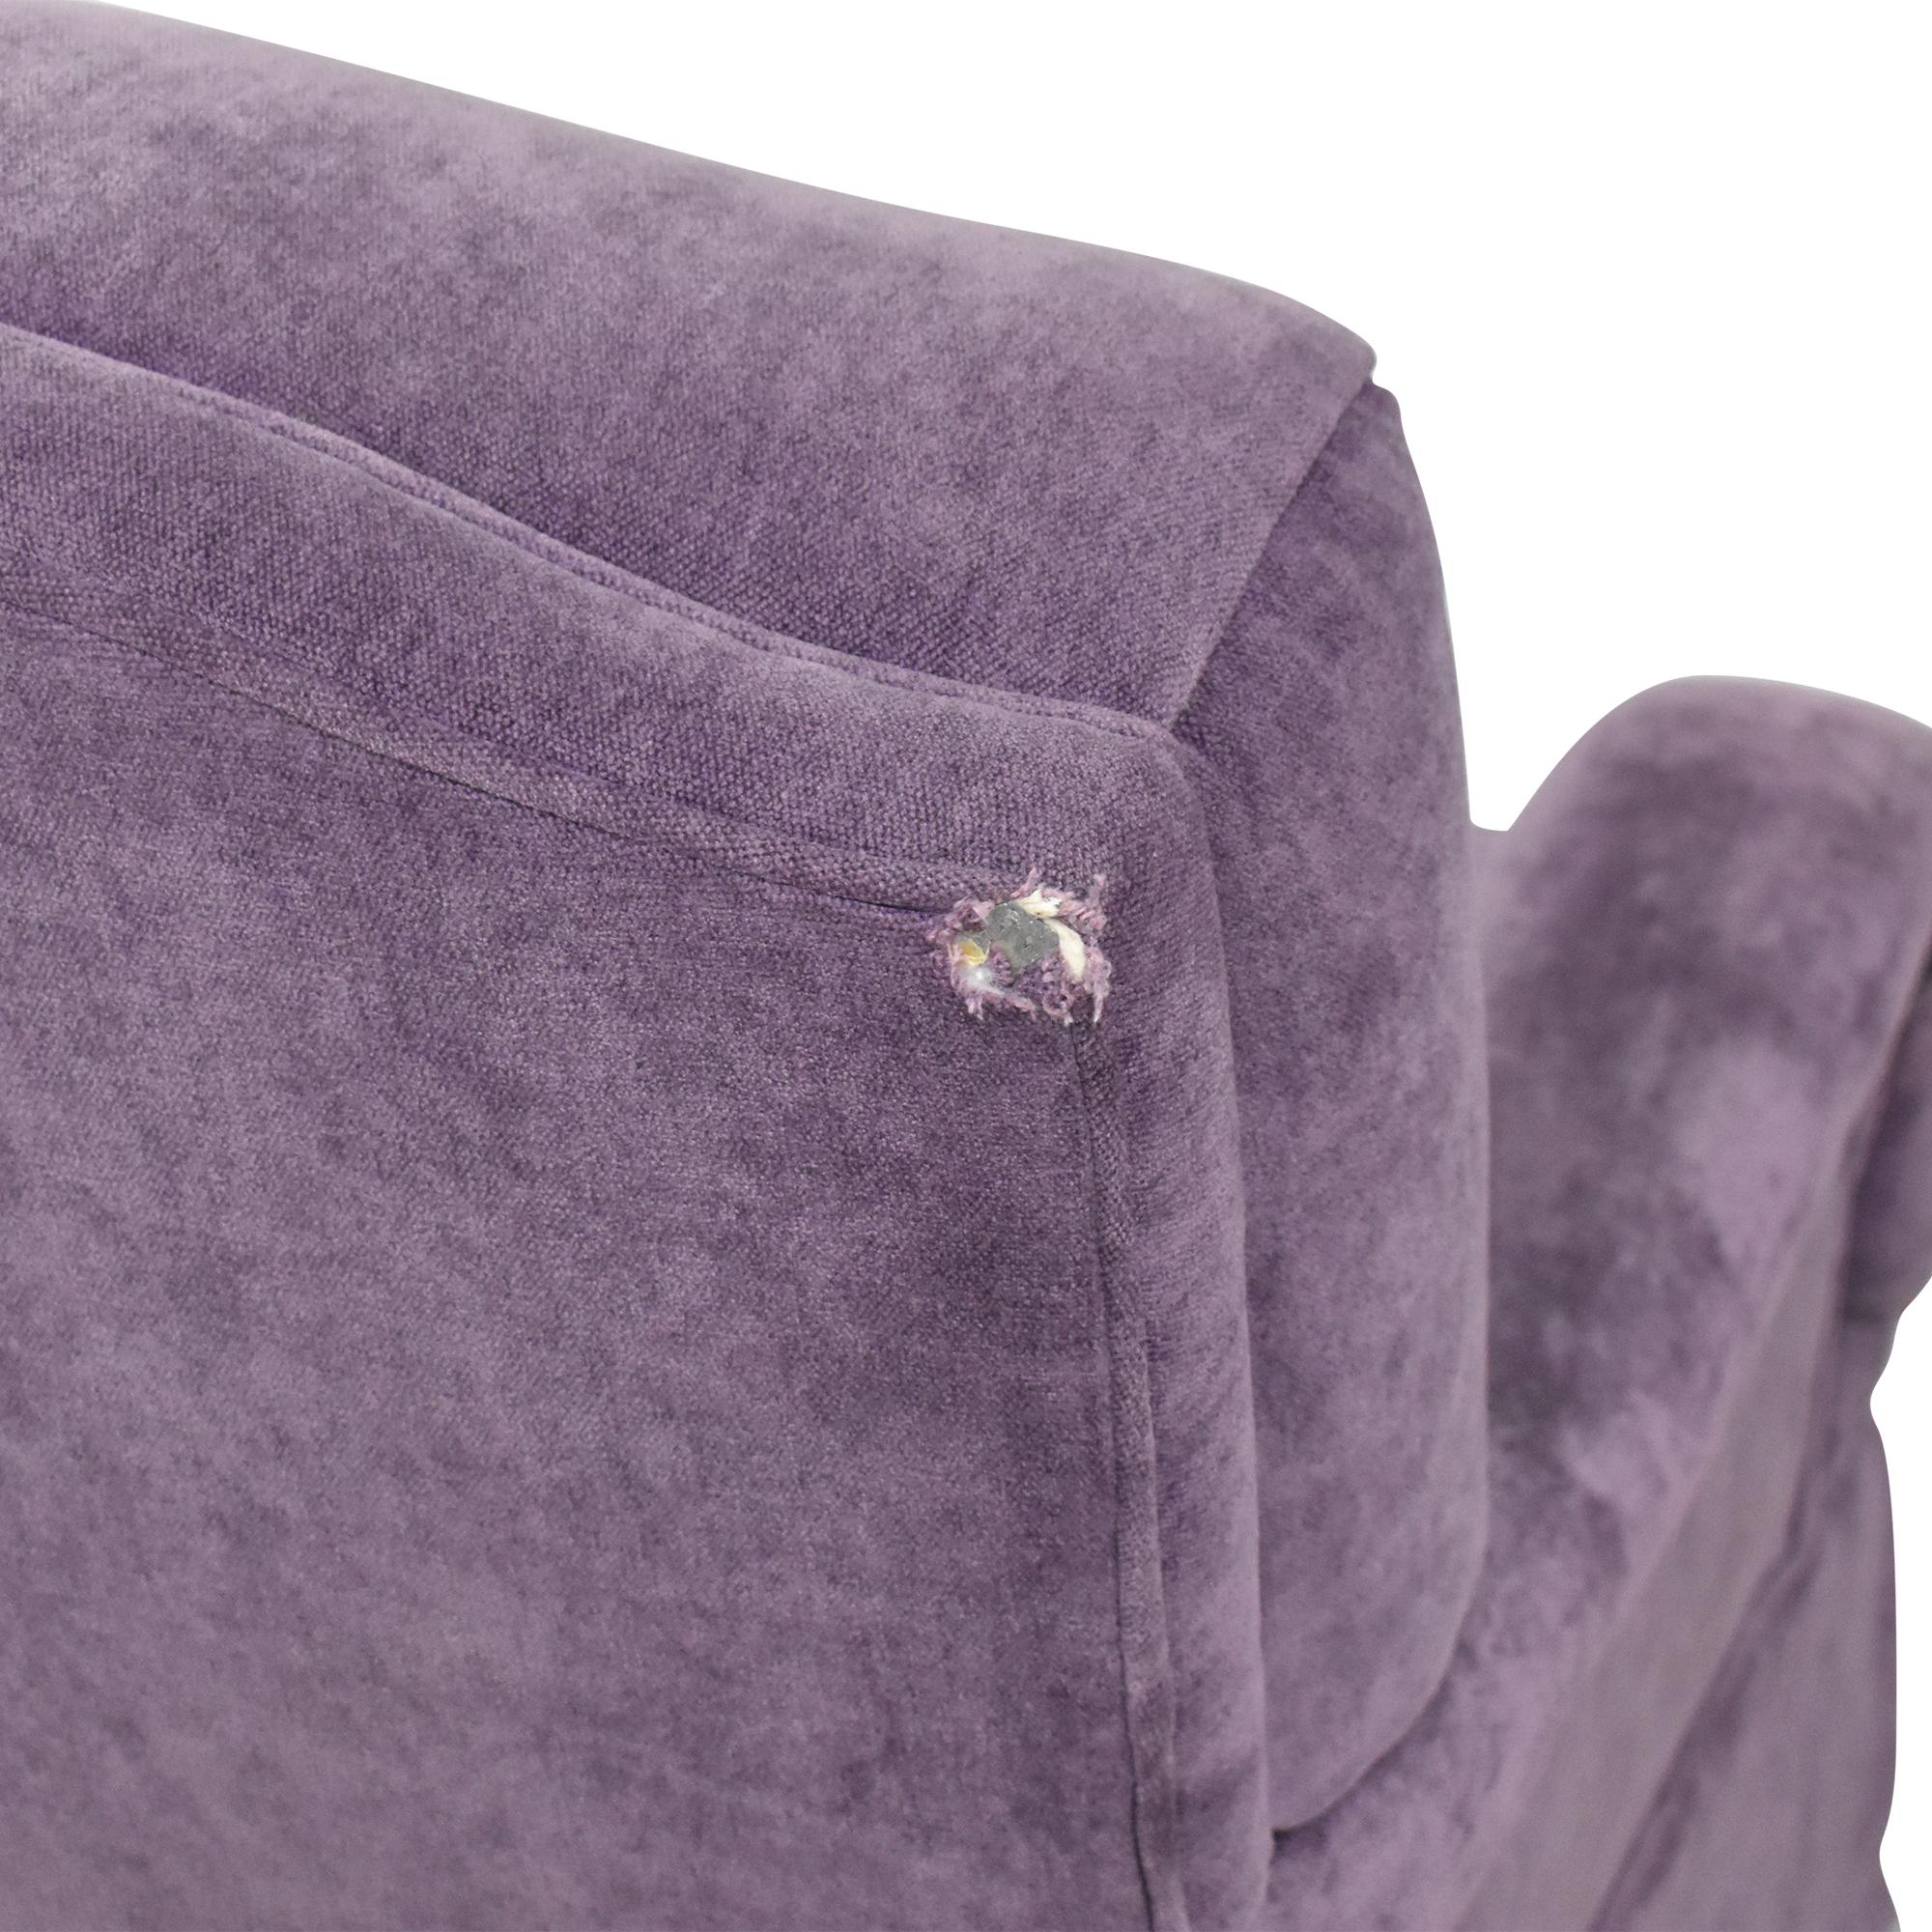 Greenbaum Interiors Greenbaum Interiors Swivel Tufted Arm Chair nj